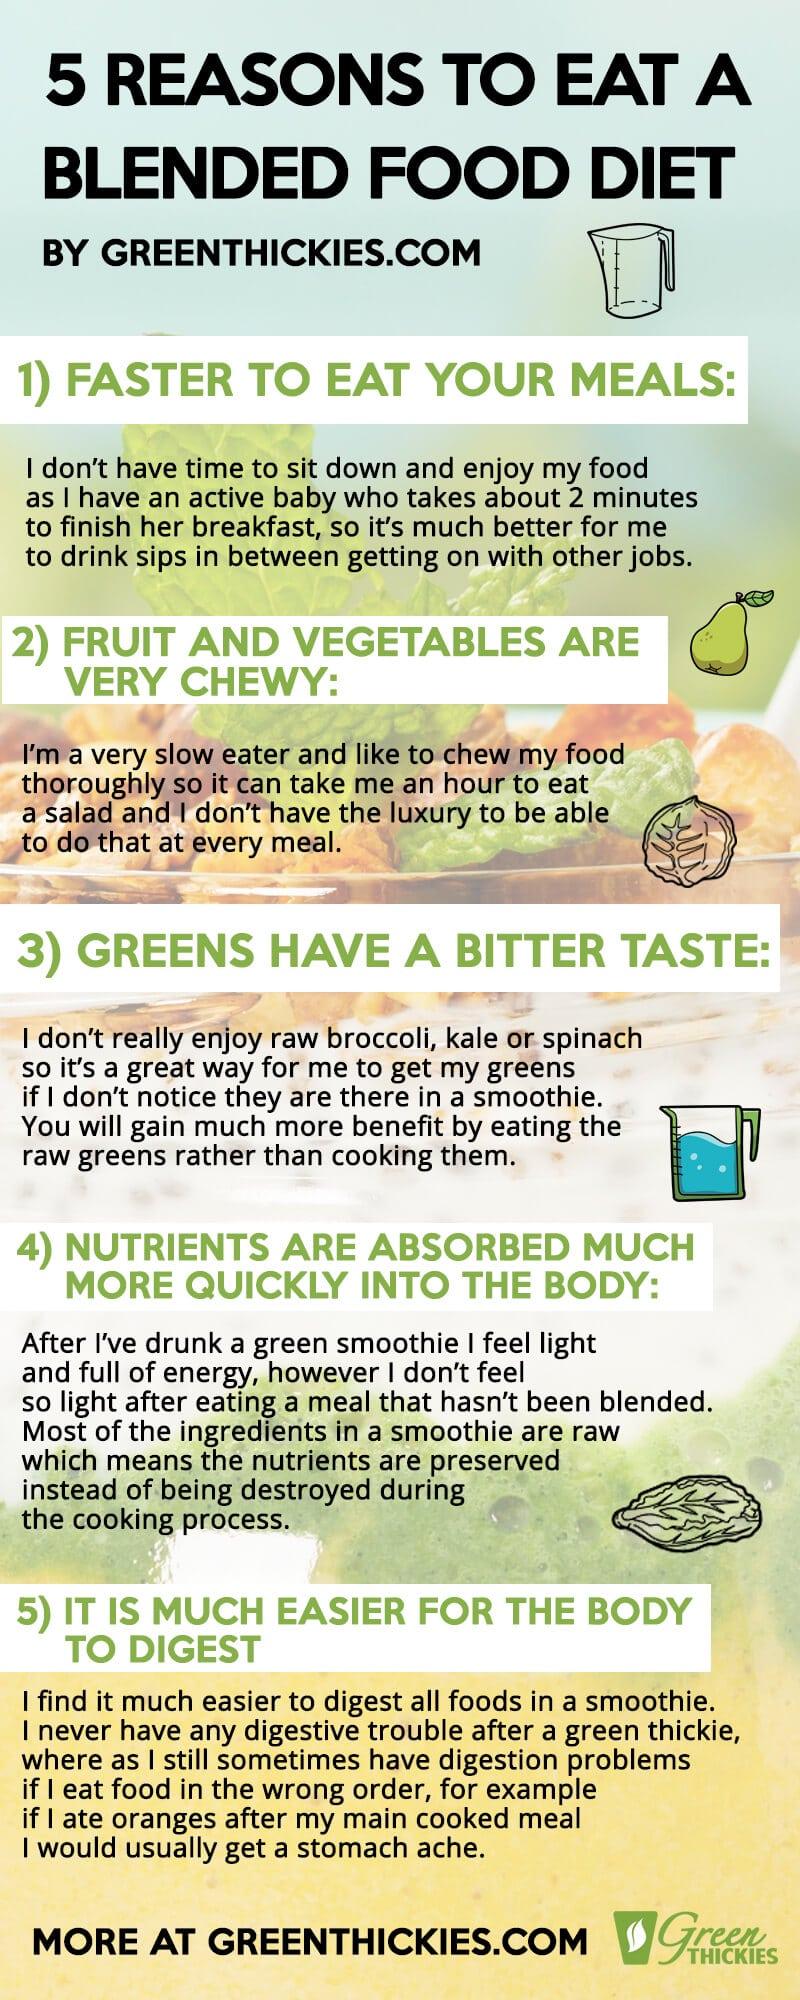 Complete Ninja Blender Guide; 6 reasons to eat a blended food diet